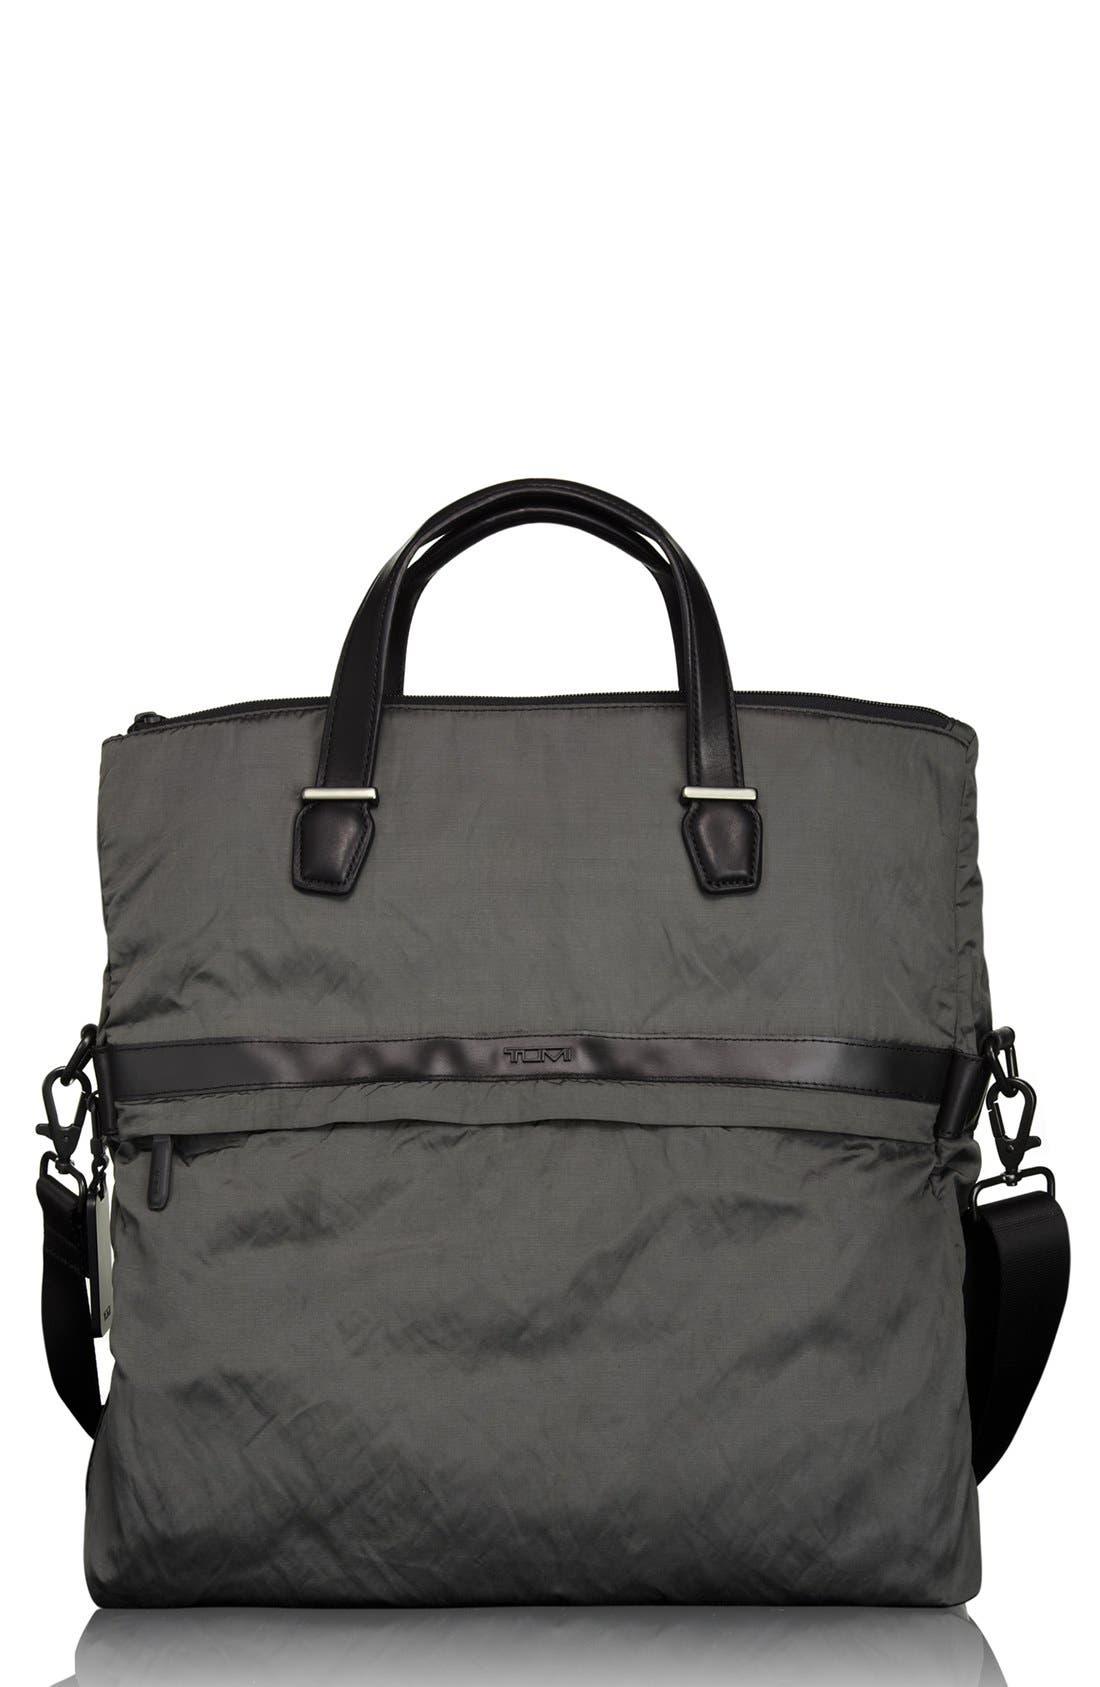 Main Image - Tumi 'Virtue - Triumph' Tote Bag